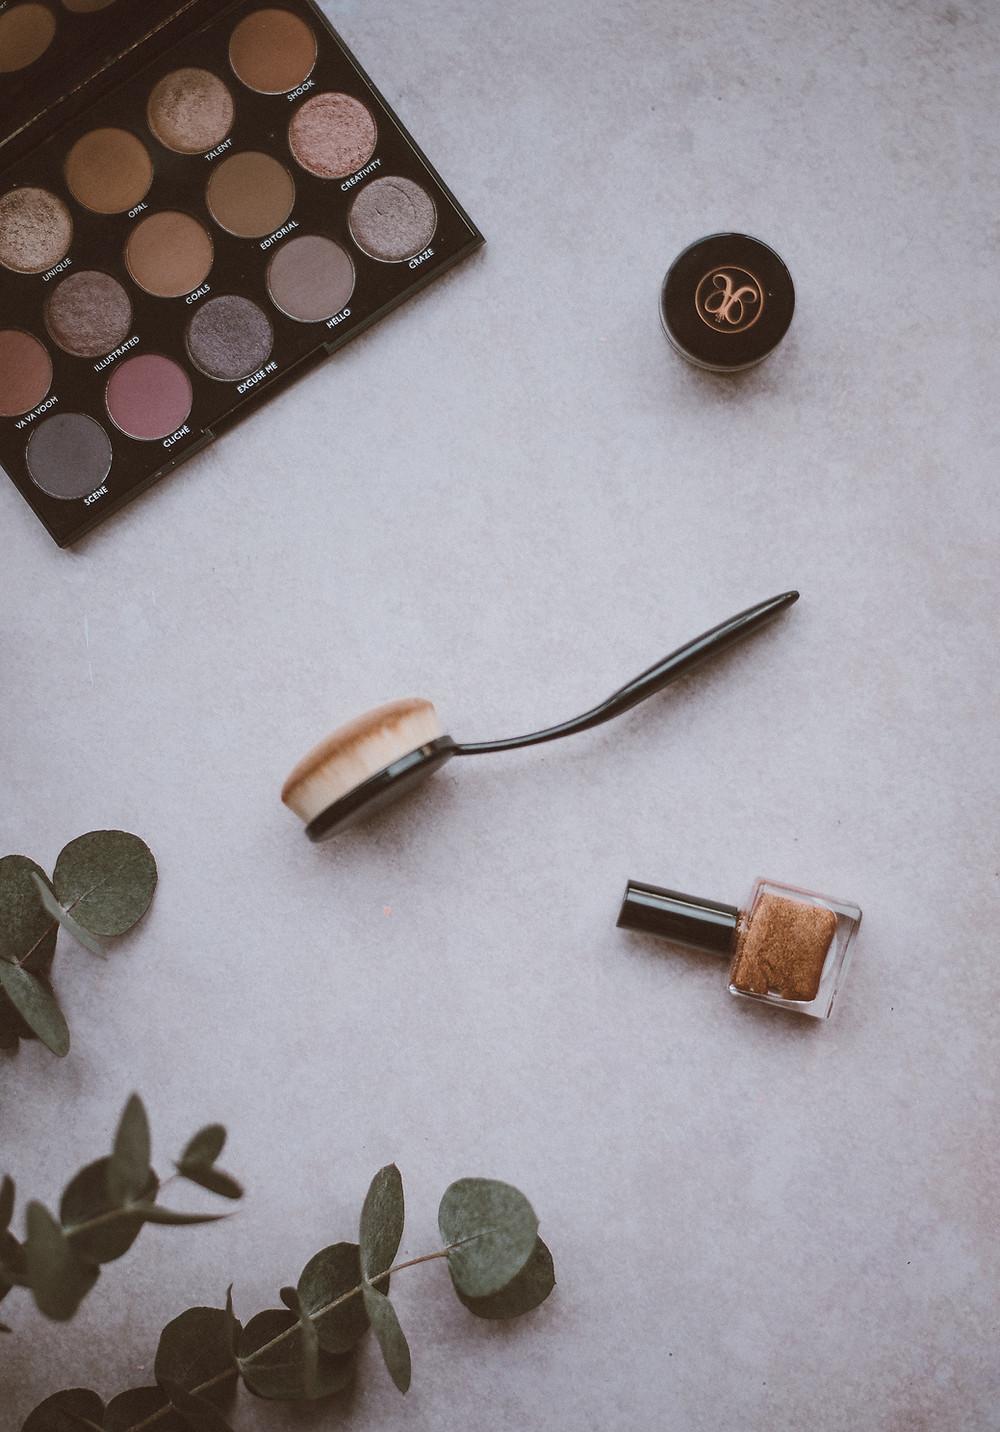 Skincare Solutions For Managing Problem Skin